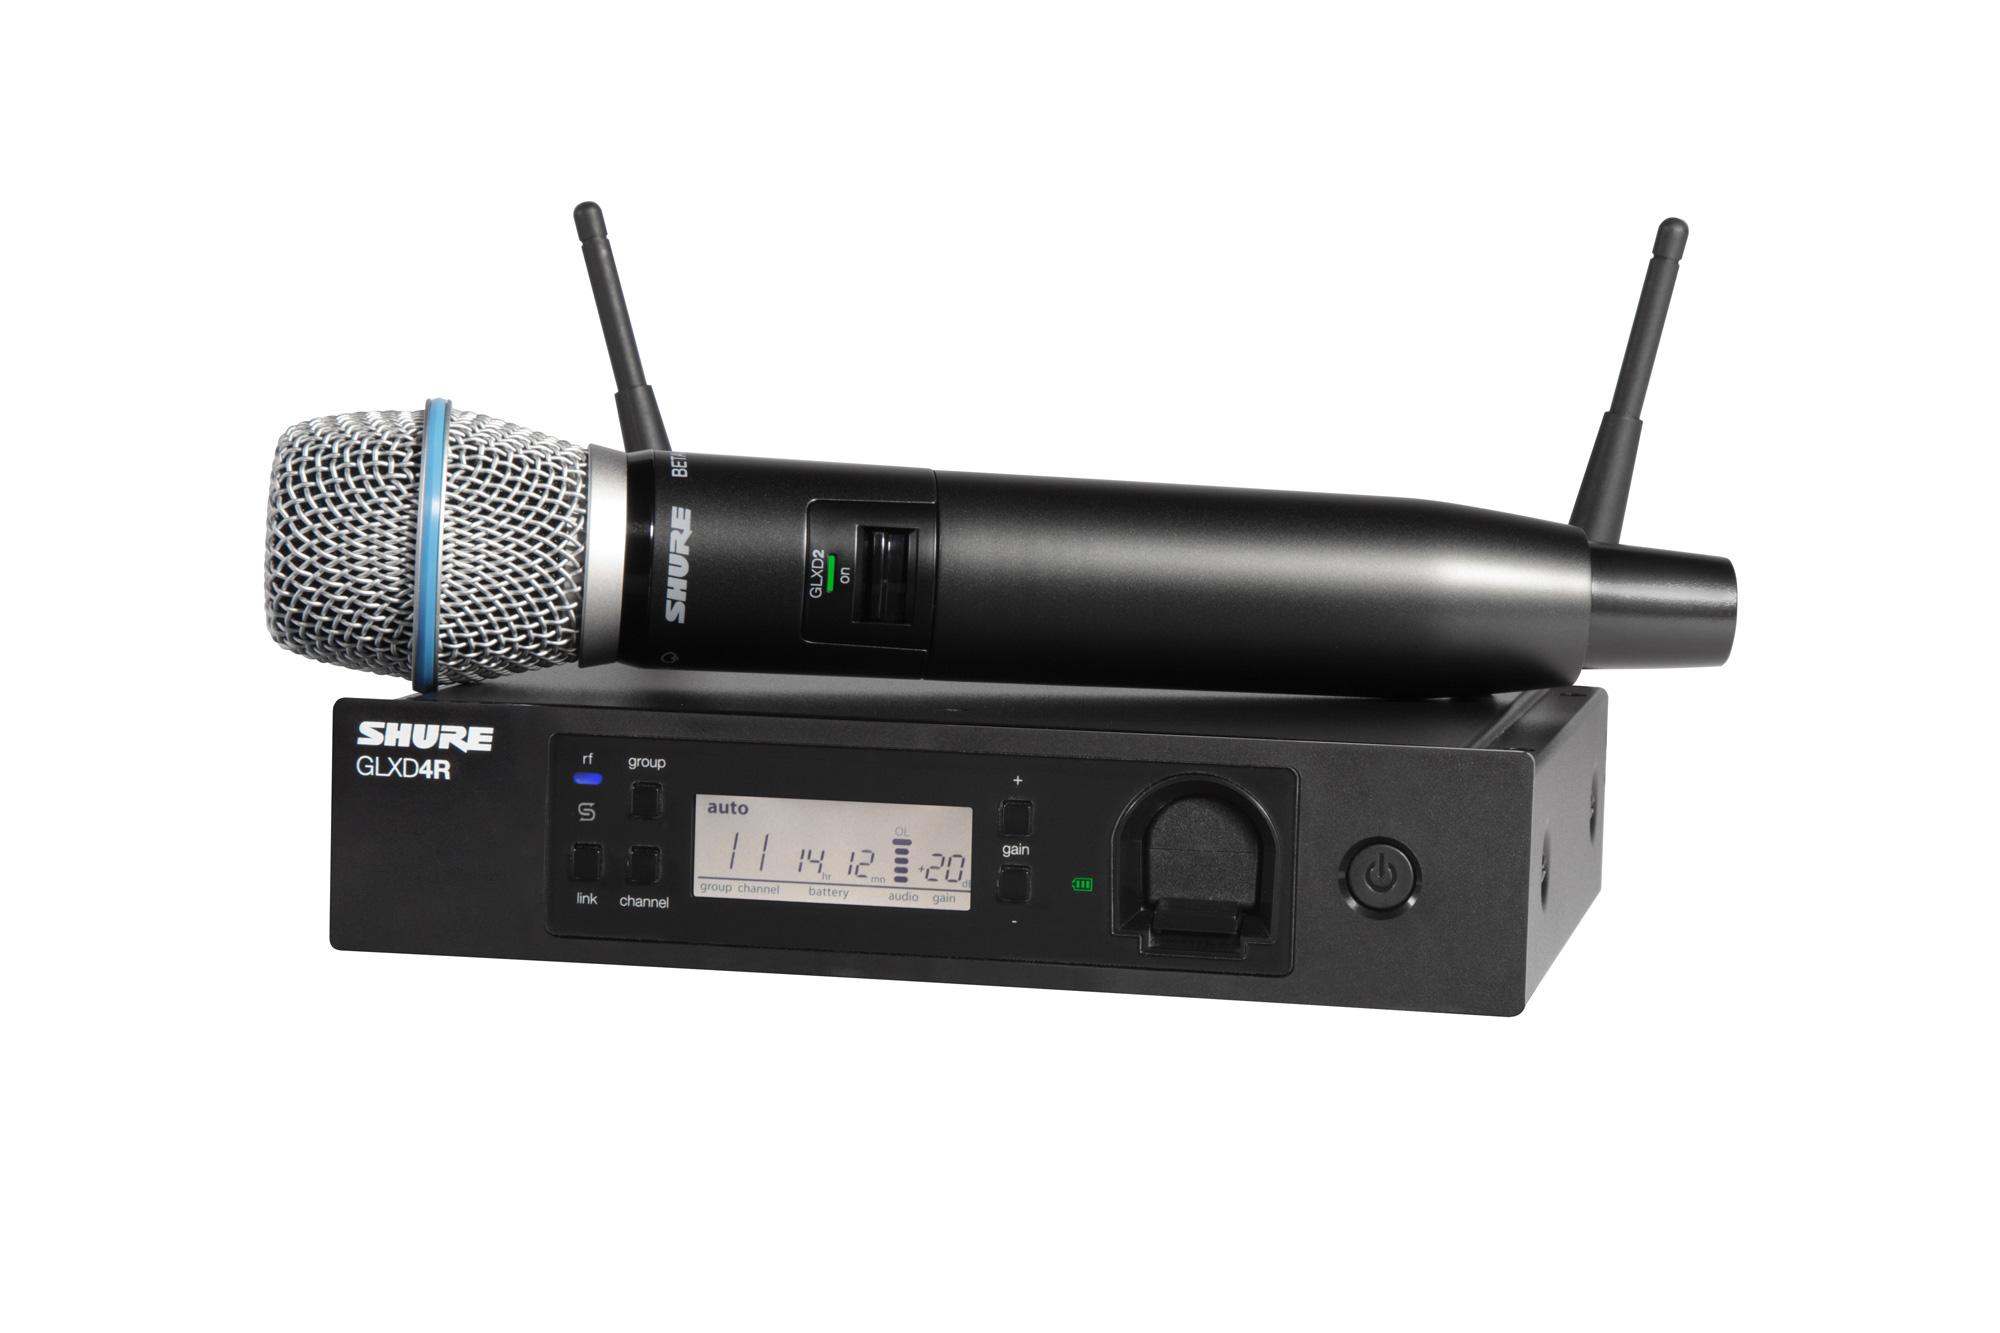 Shure Microphone System : Shure glxd r b a advanced wireless microphone